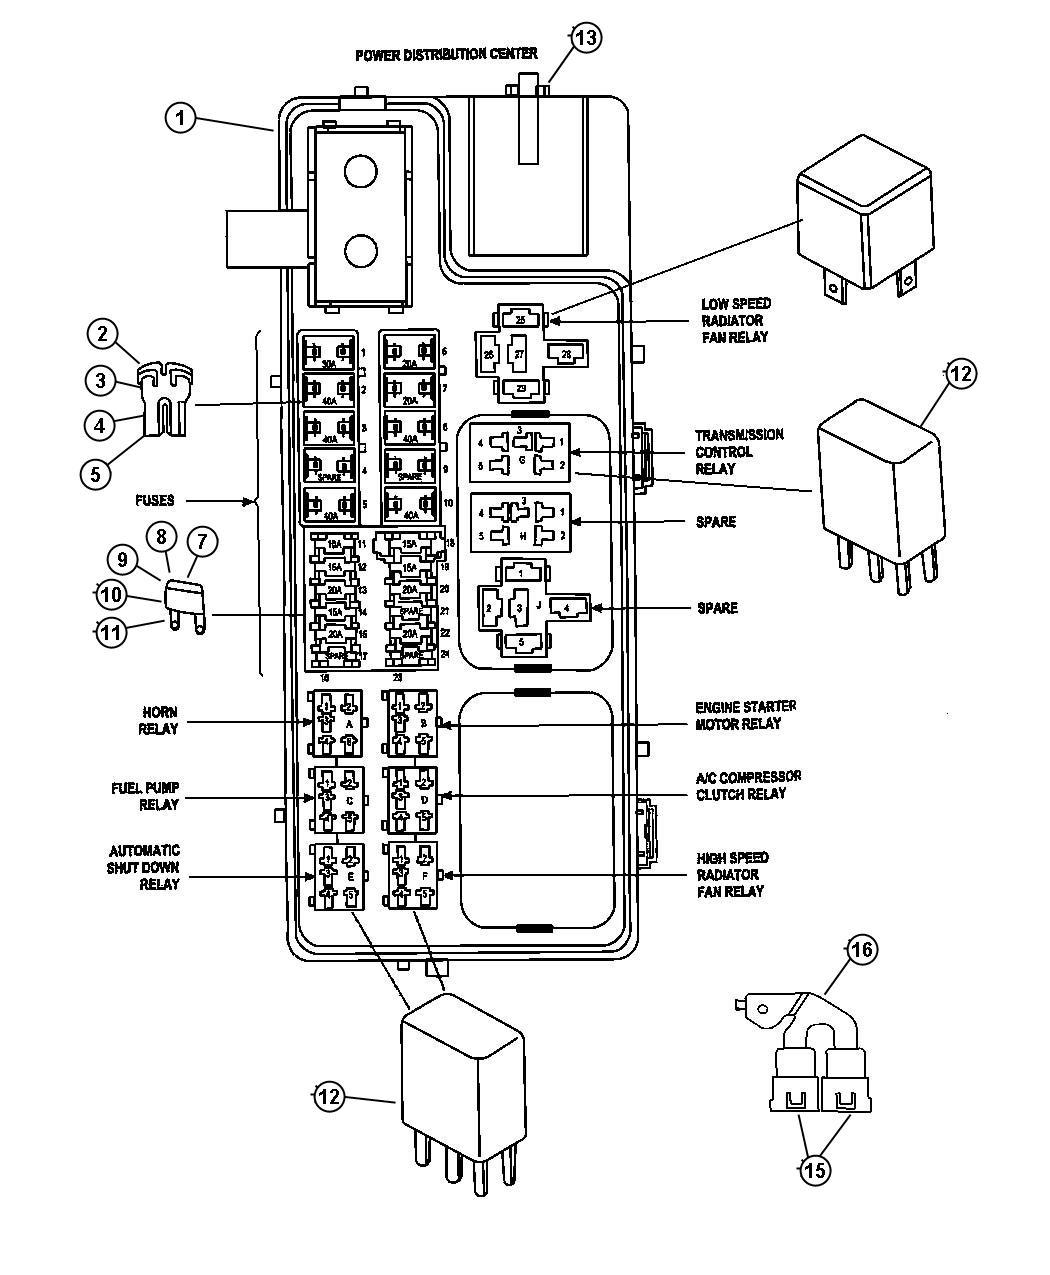 fuse box diagram for 2005 chrysler sebring fuse box